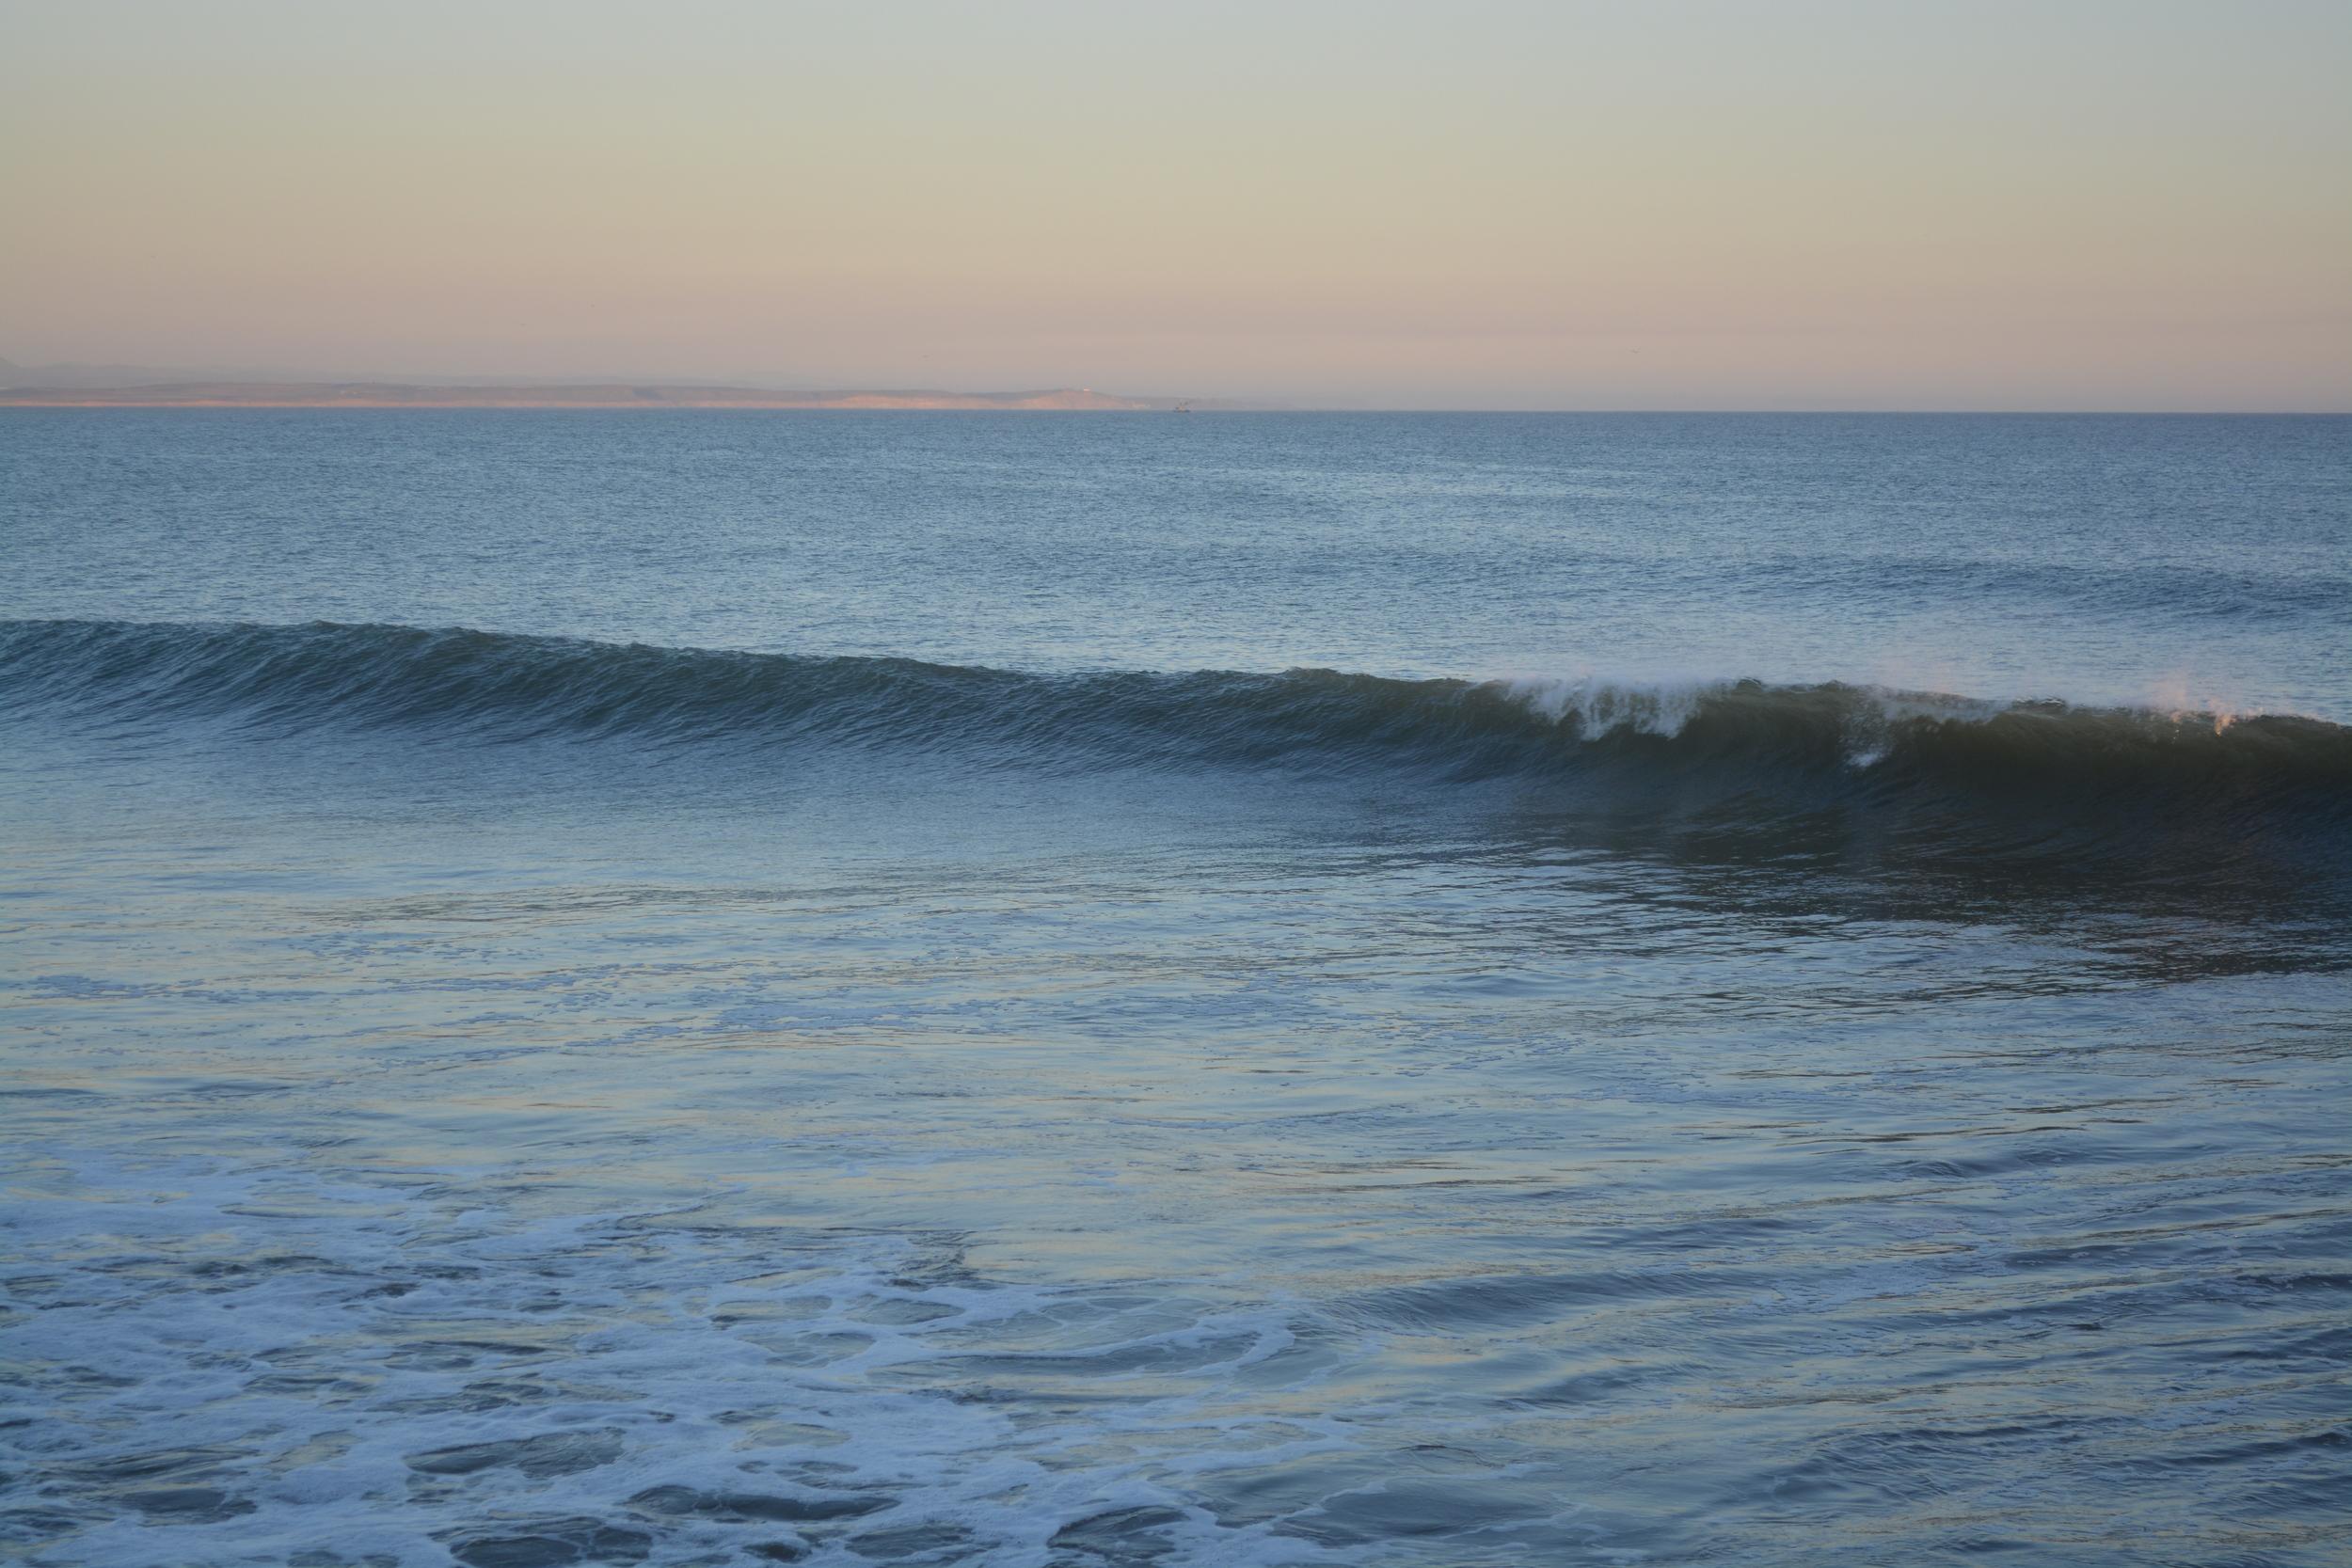 Baja California 10-5-13 Shipwrecks Surfing Adventure Ocean Experience Surf School San Diego (26).JPG